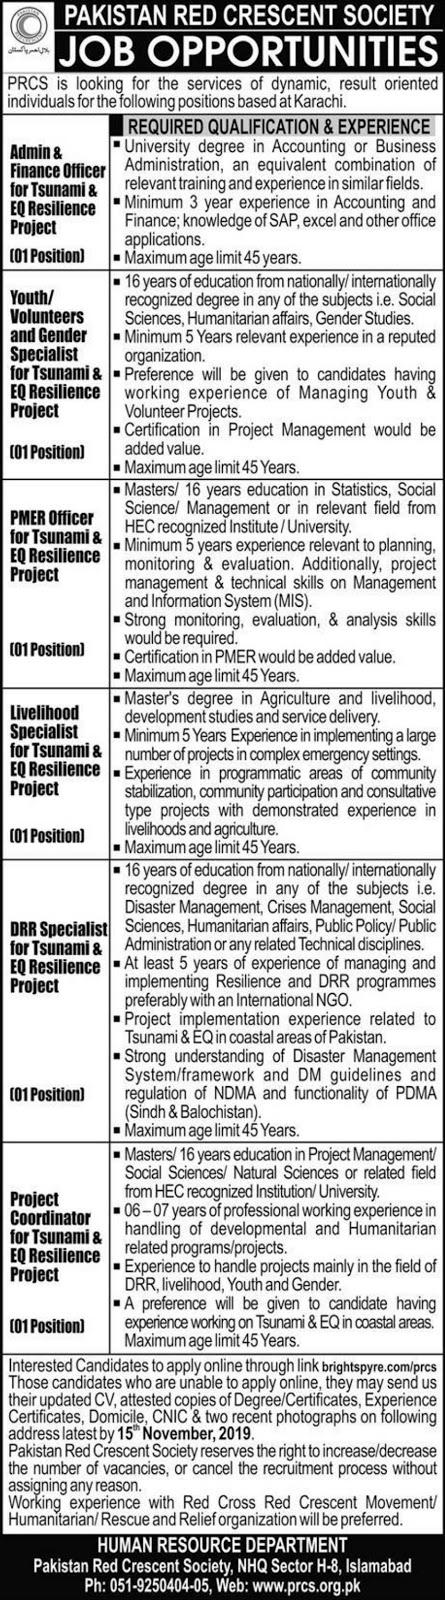 Pakistan Red Crescent Society PRCS Jobs 2019 Karachi Latest